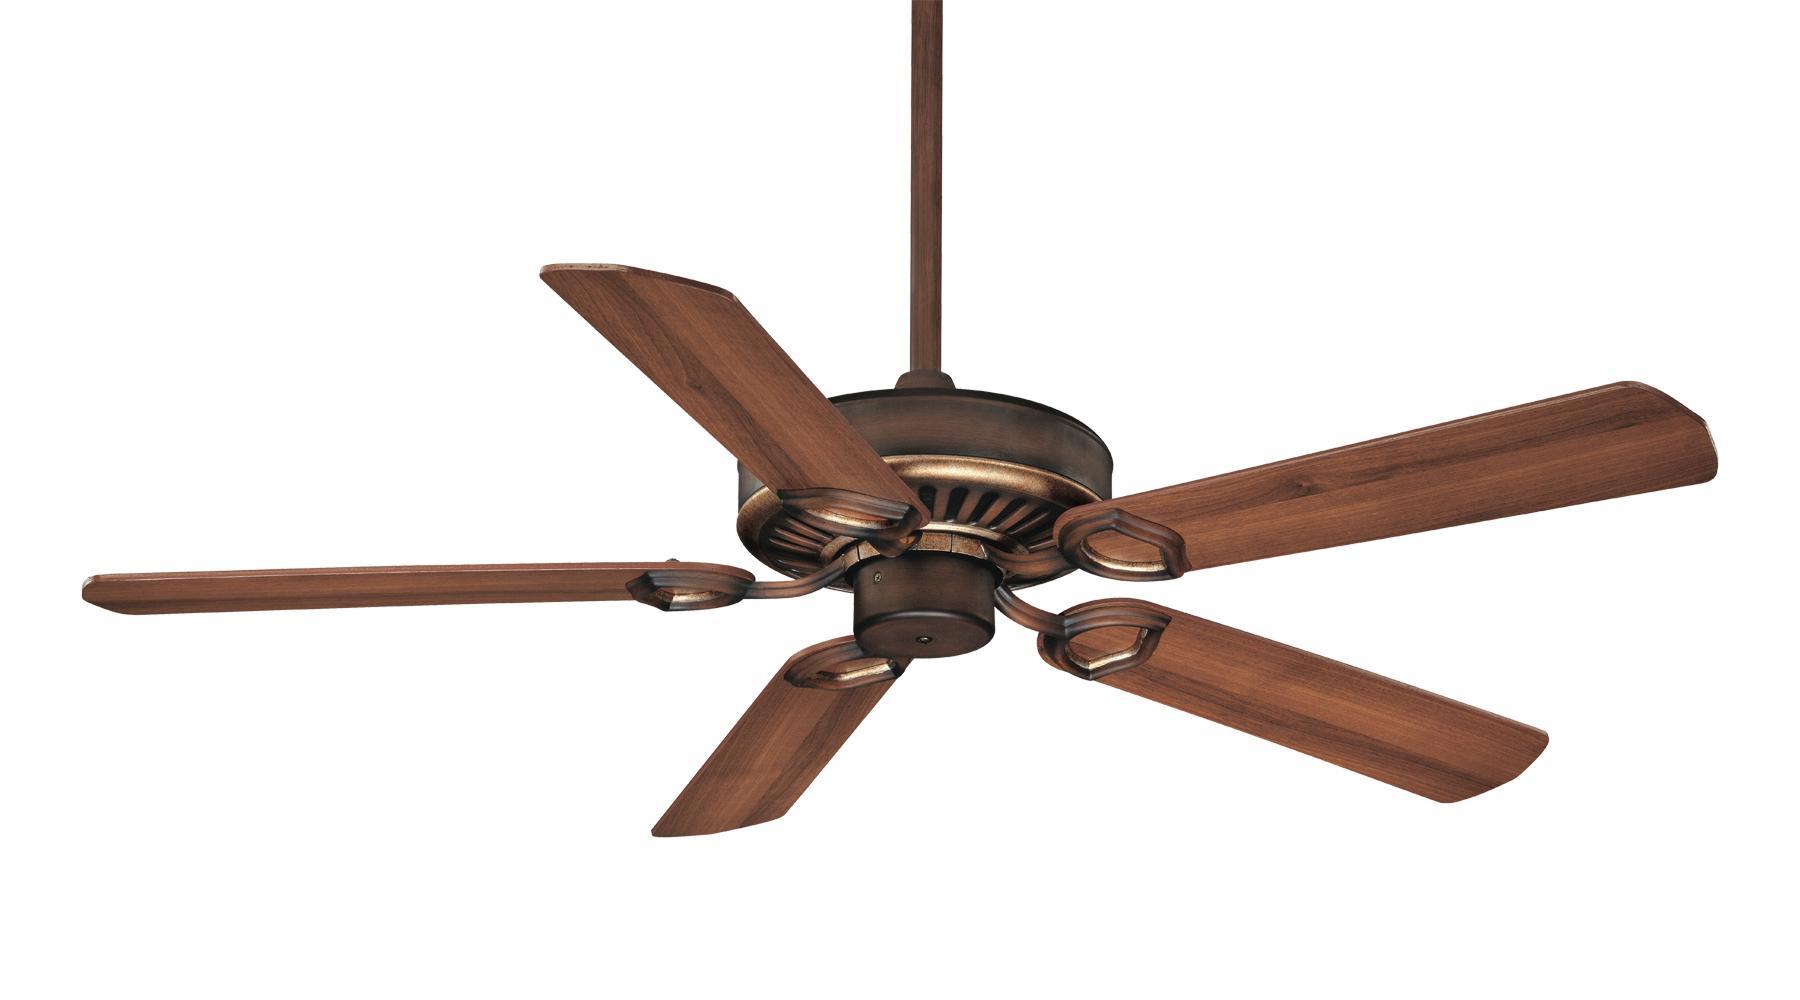 wooden-ceiling-fans-photo-9